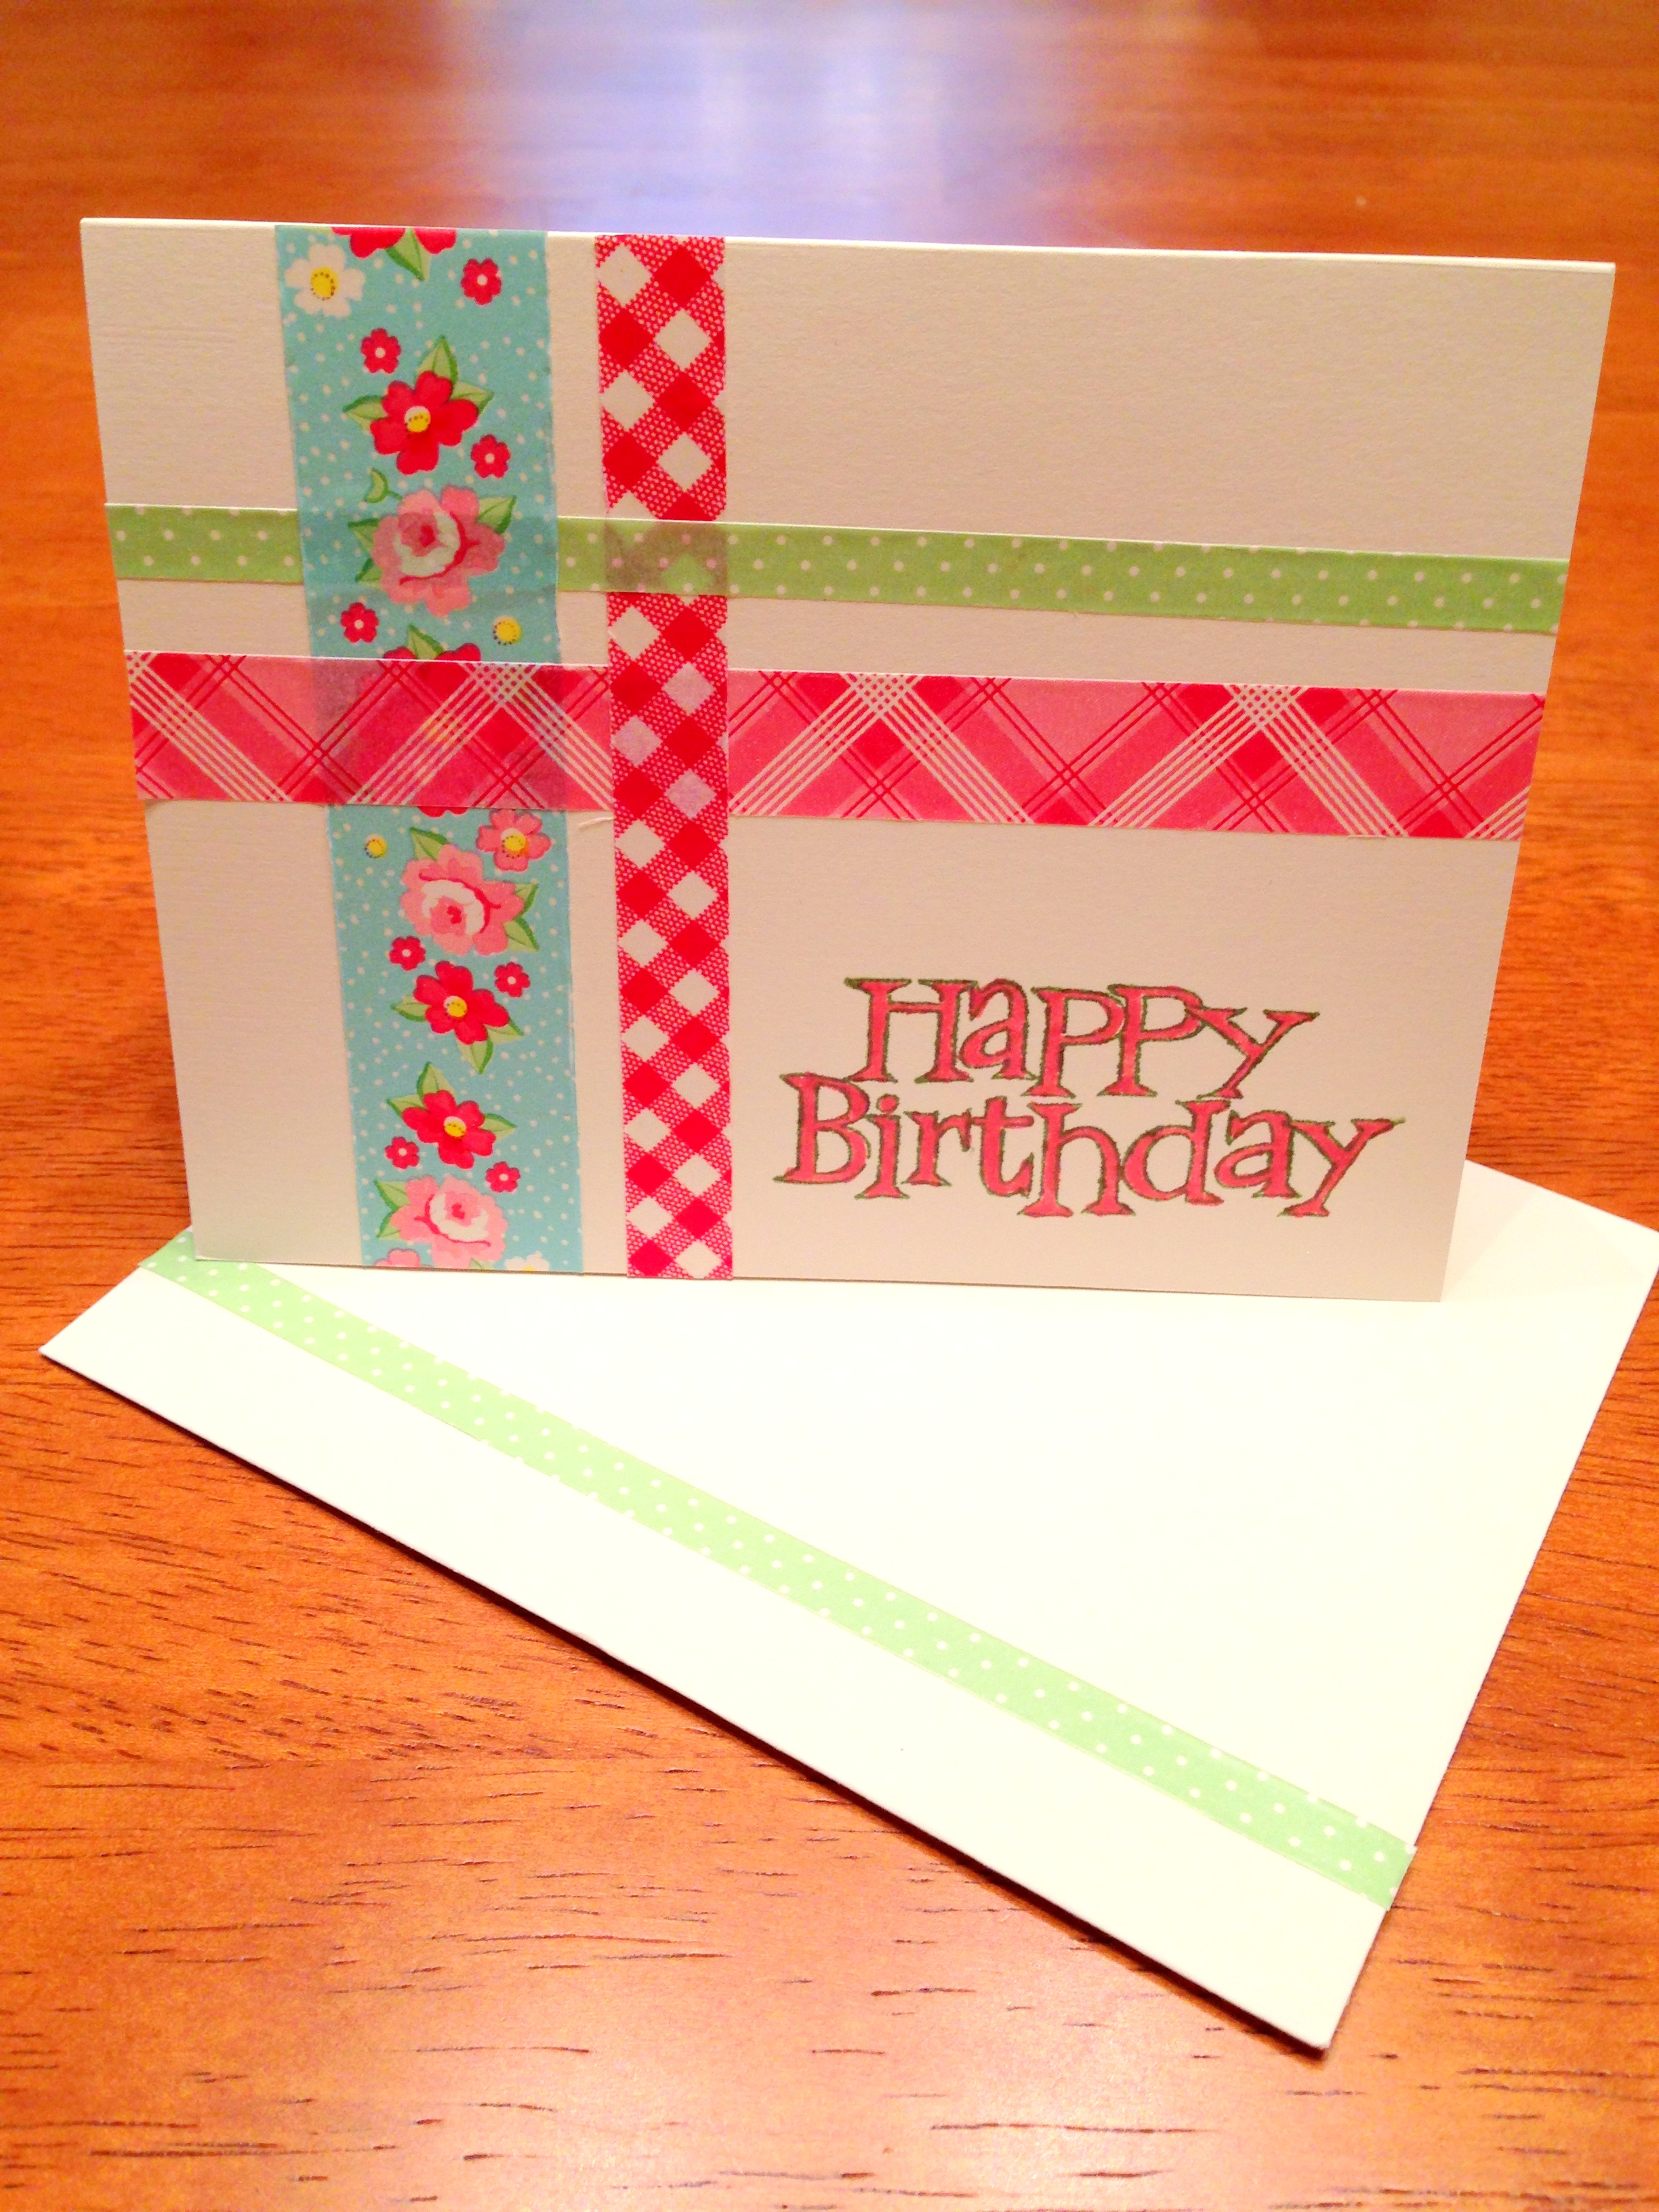 DIY Washi Tape Birthday Card - Styled by Jess